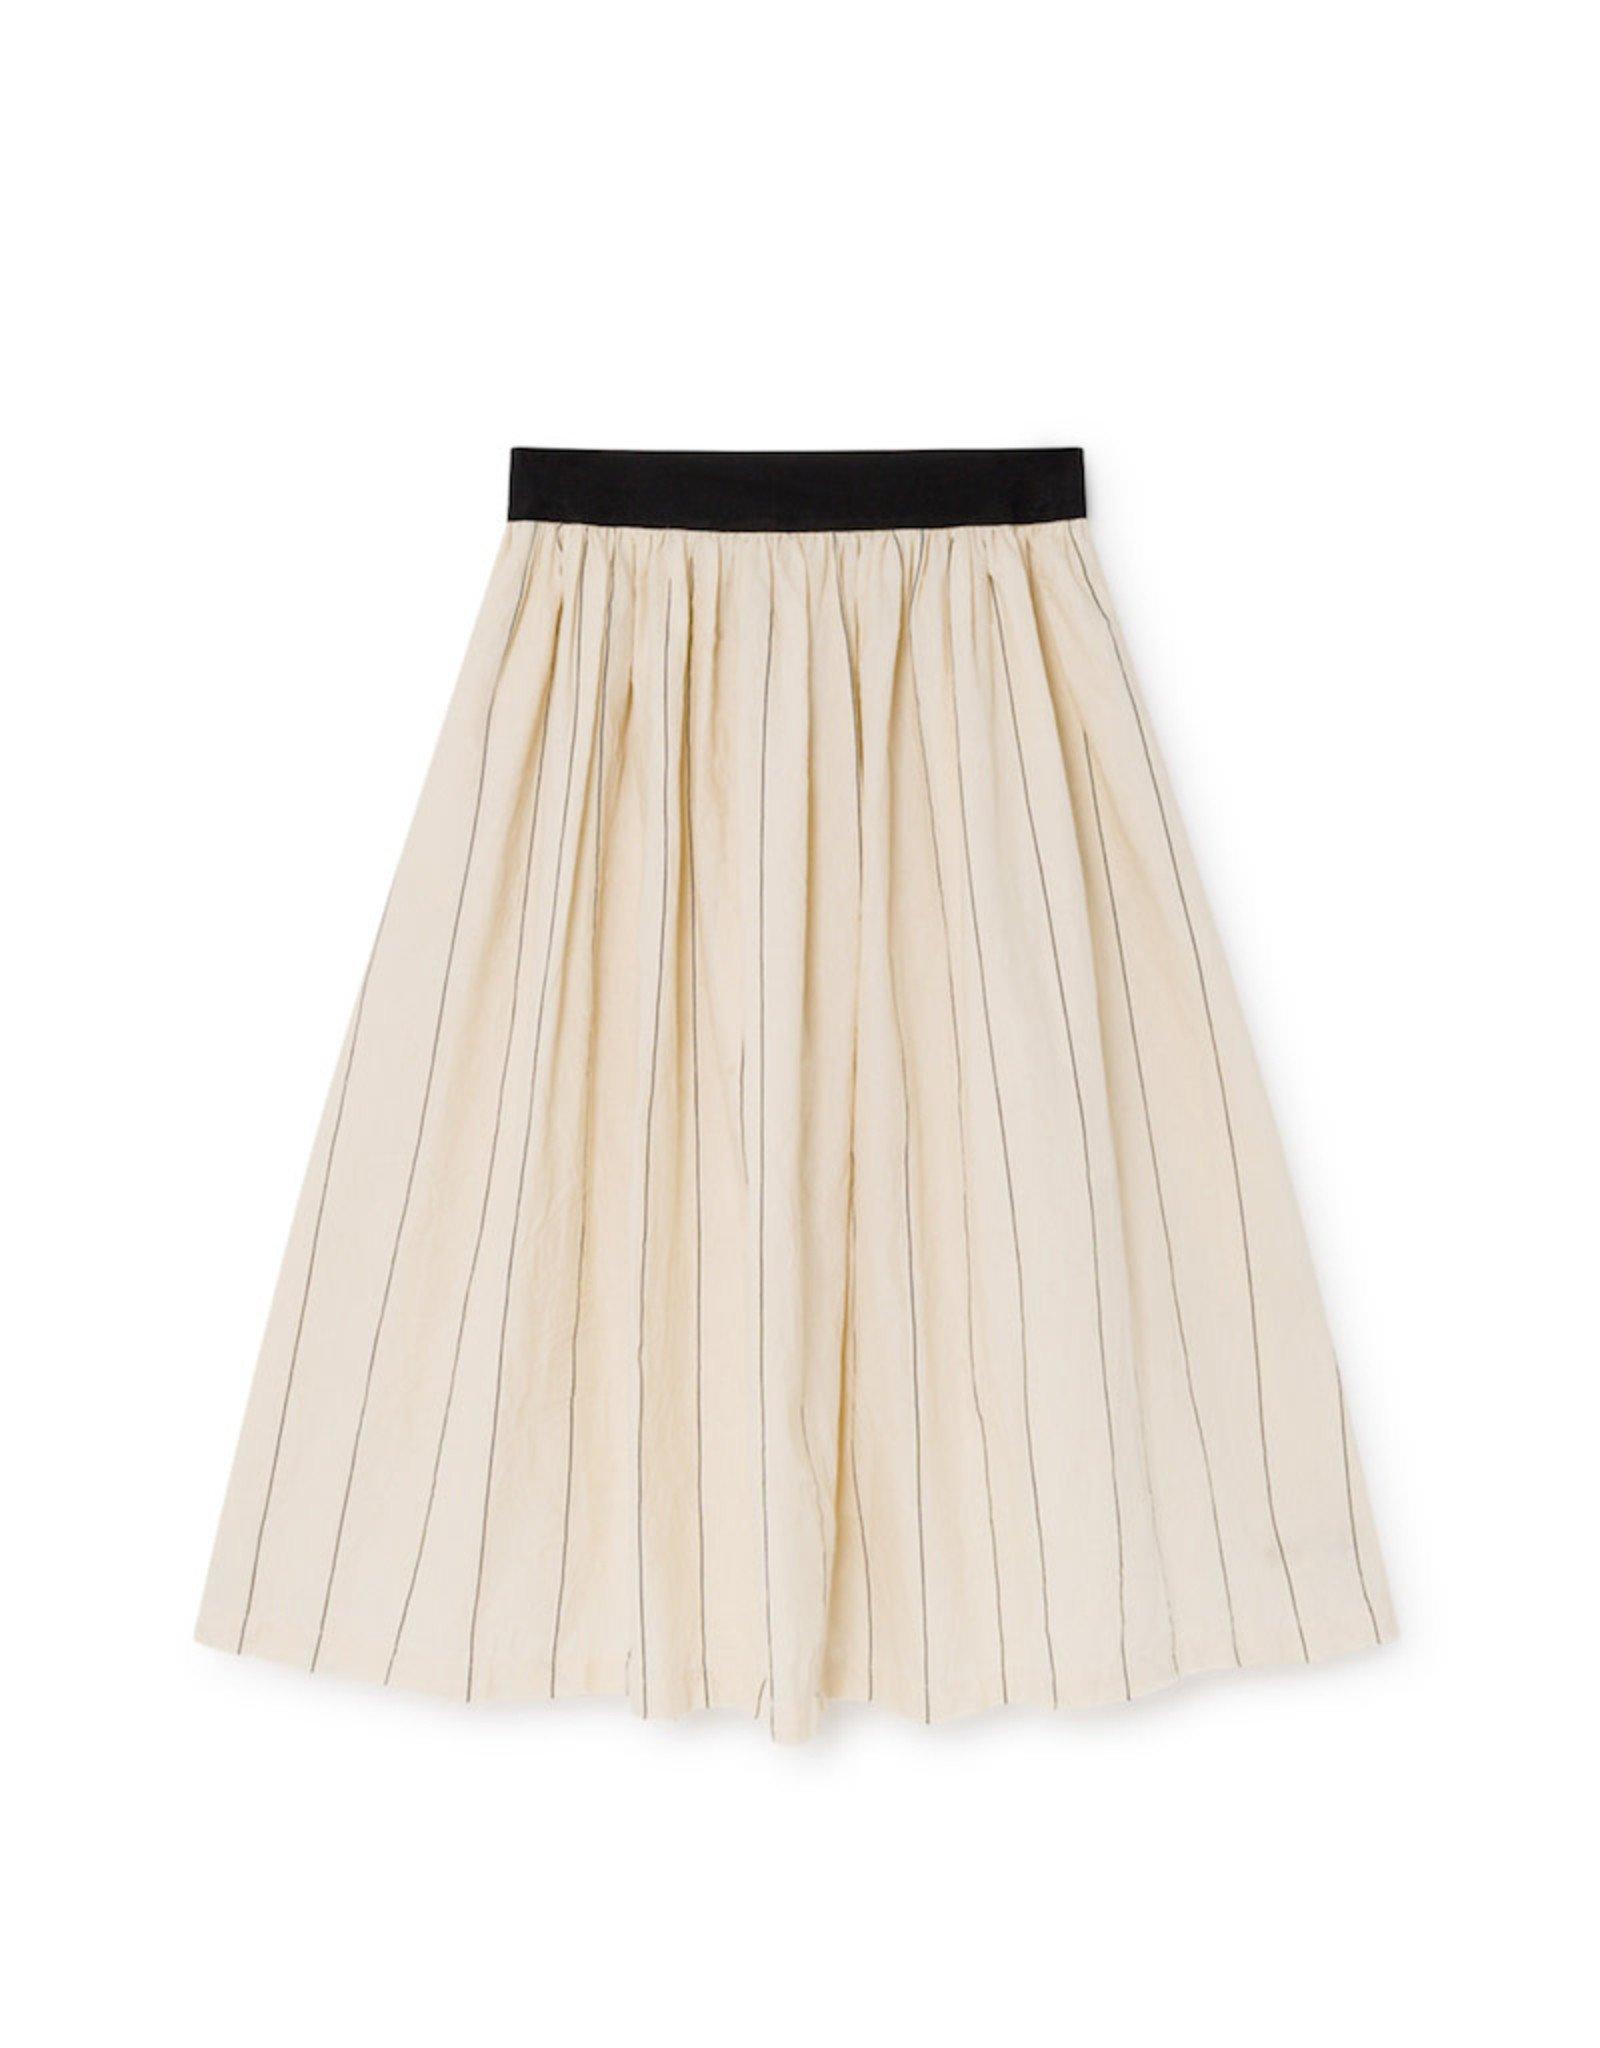 Little Creative Factory Thin-Striped Skirt Cream